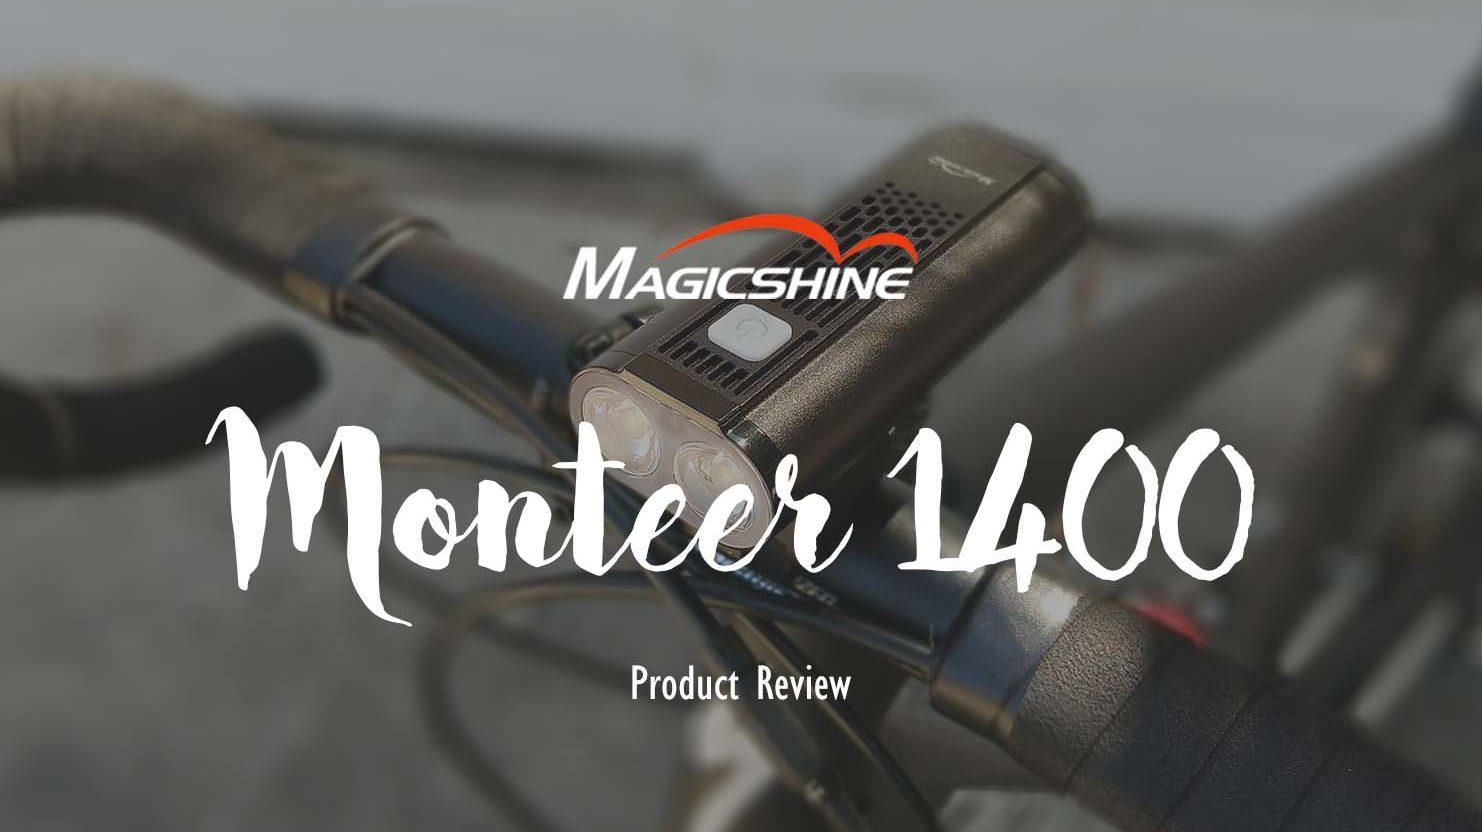 Magicshine  Monteer 1400